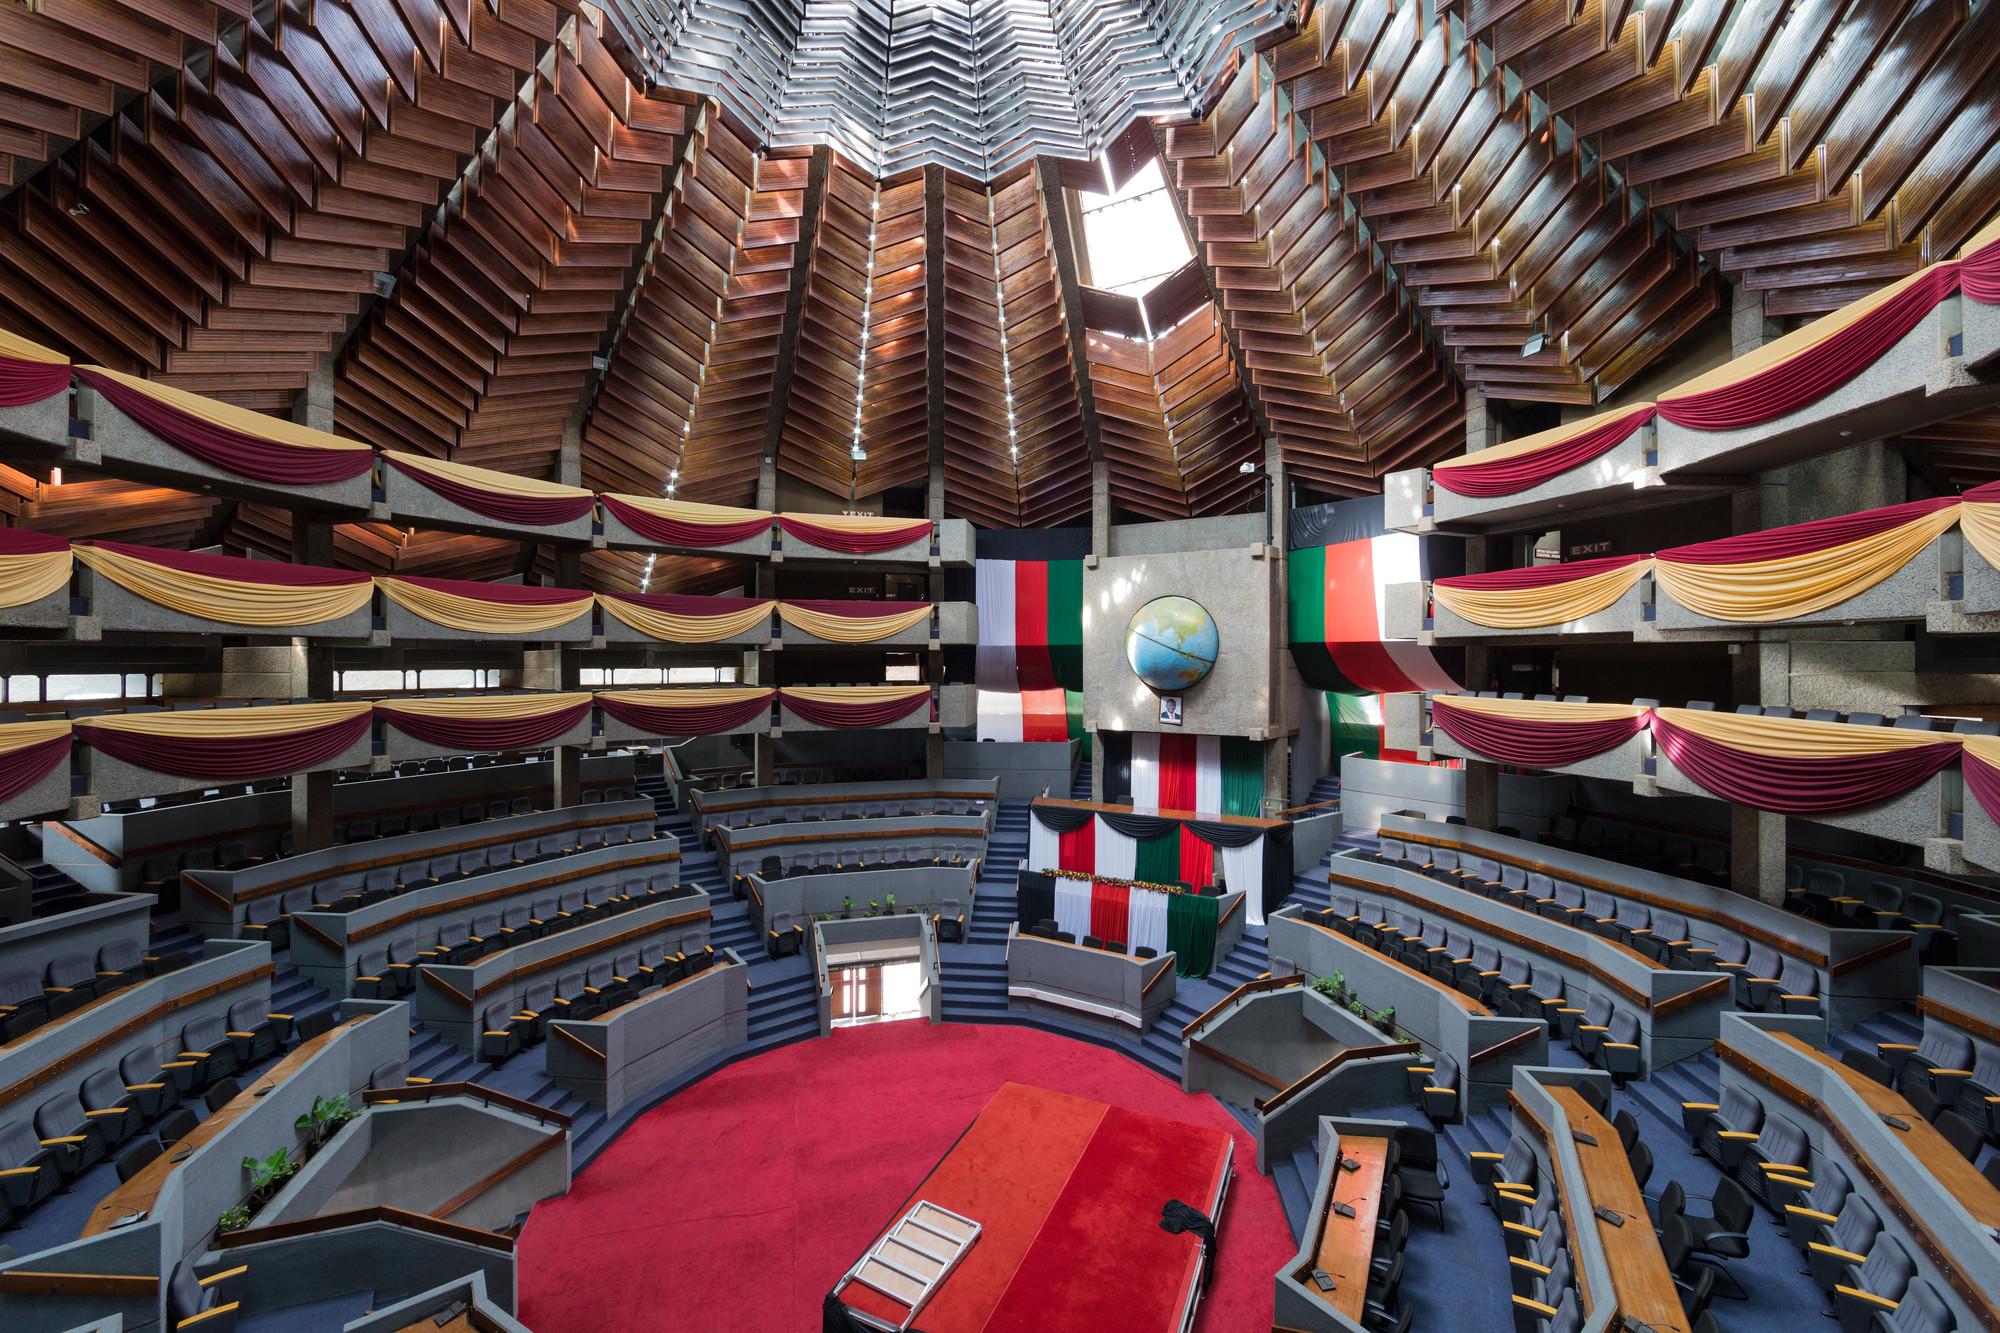 Centro de Conferencias Internacionales de Kenyatta, Nairobi (Kenya) por Karl Henrik Nostvik, 1967-1973. Imagen © Iwan Baan